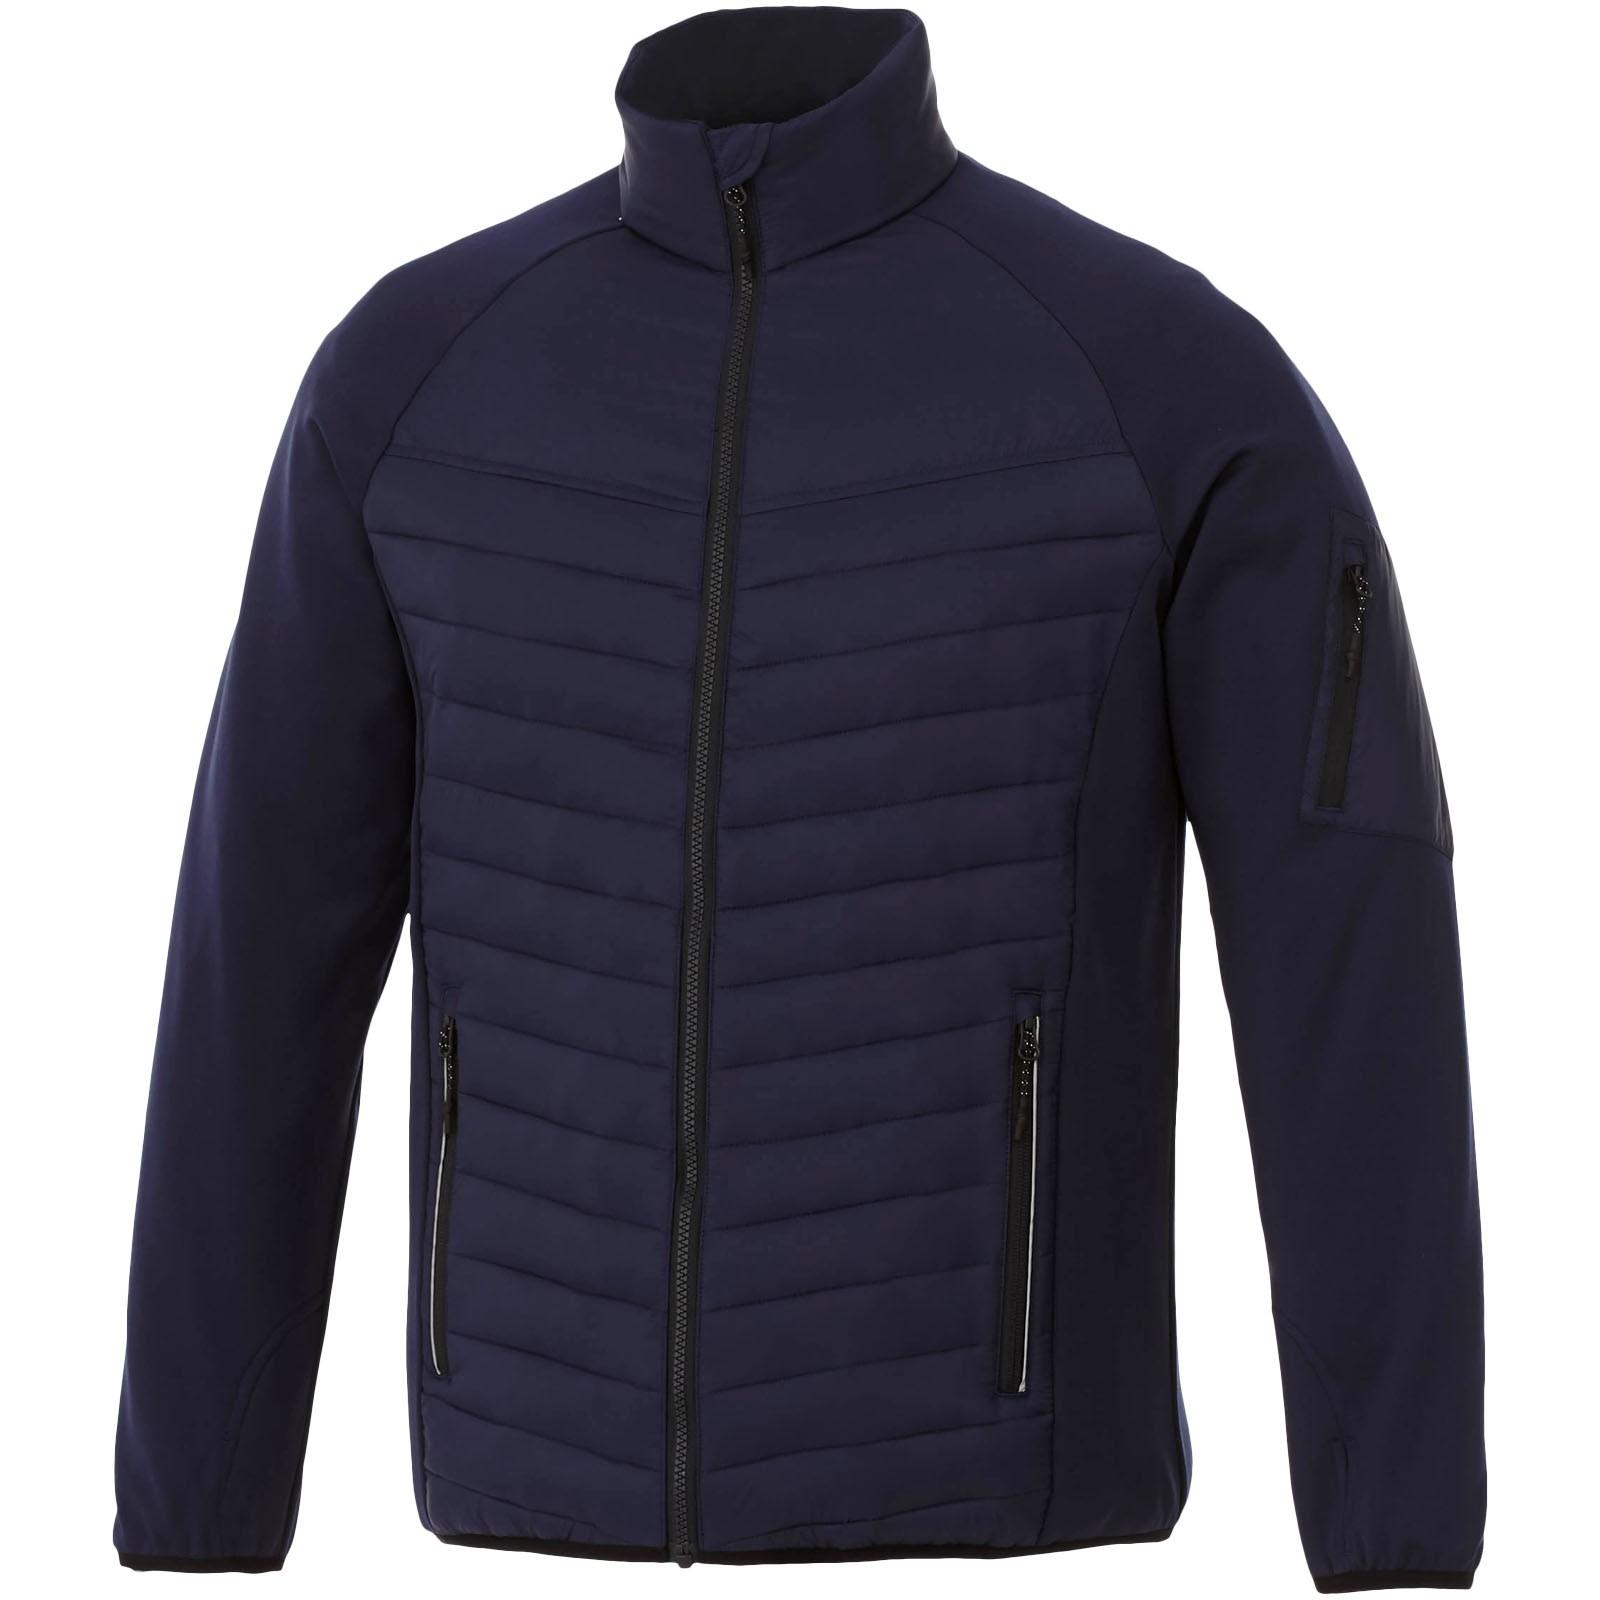 Banff hybrid insulated jacket - Navy / XS